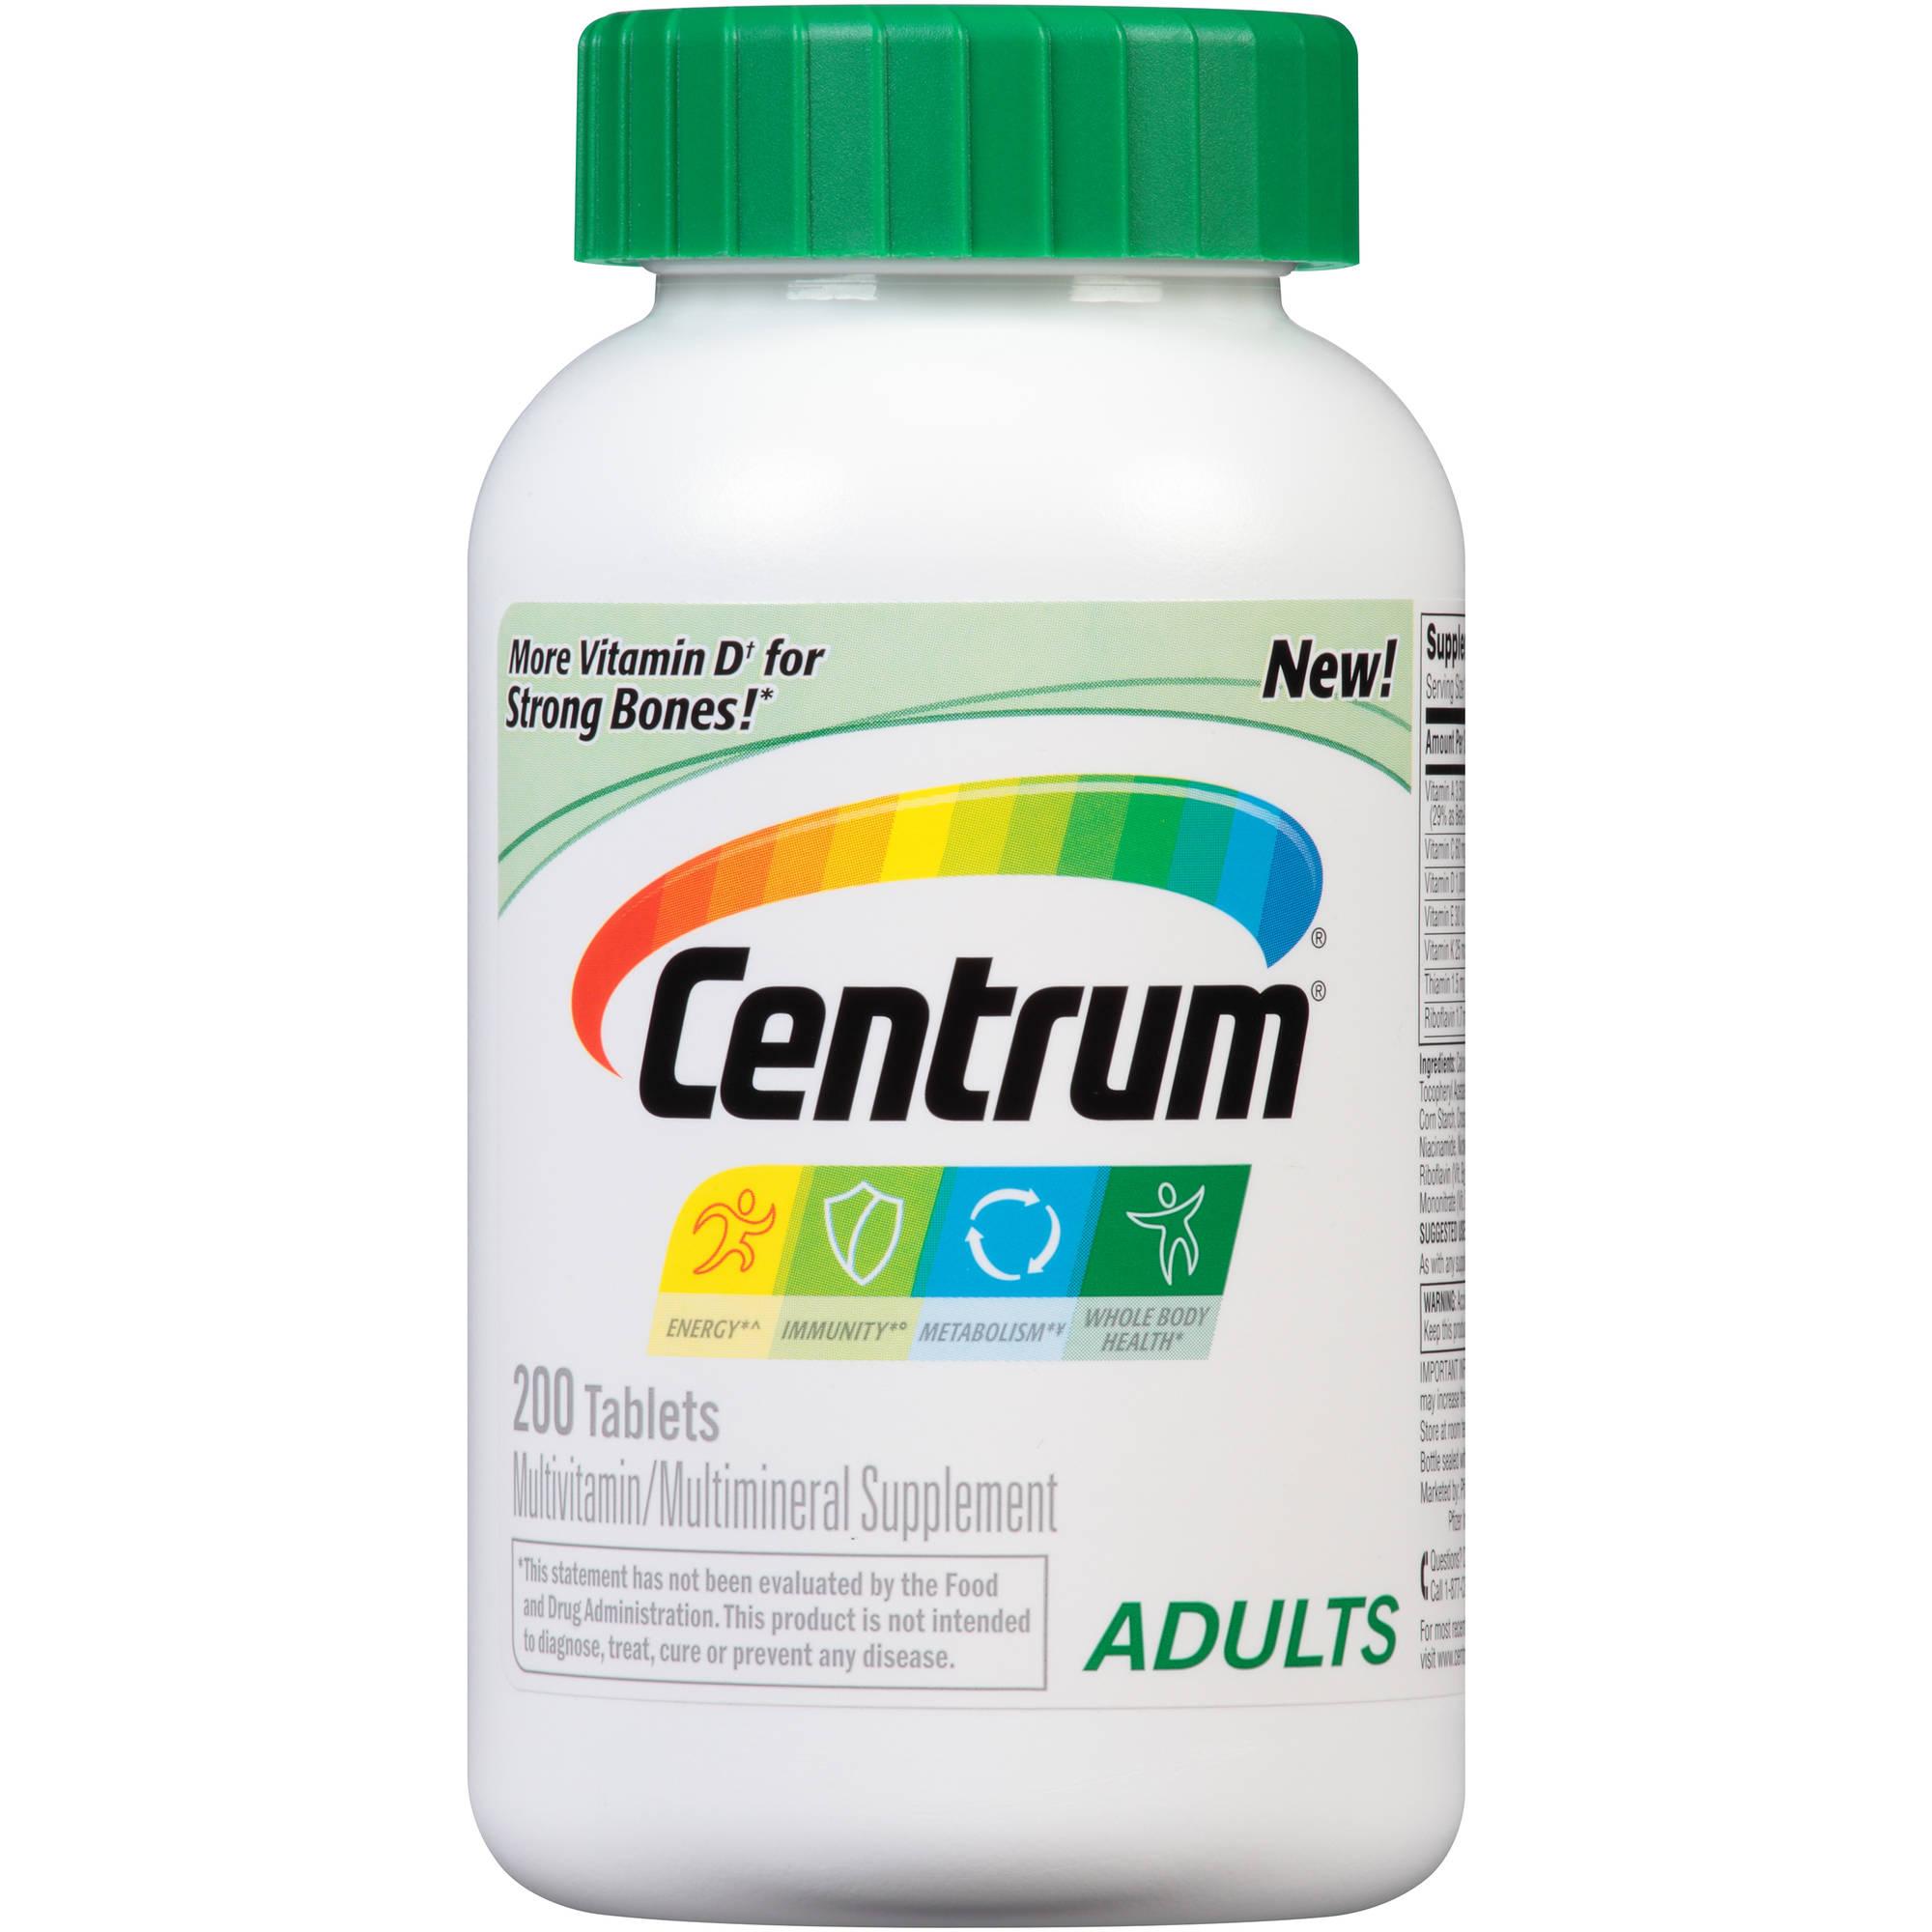 Centrum Adult Multivitamin/Multimineral Tablets 200 Count